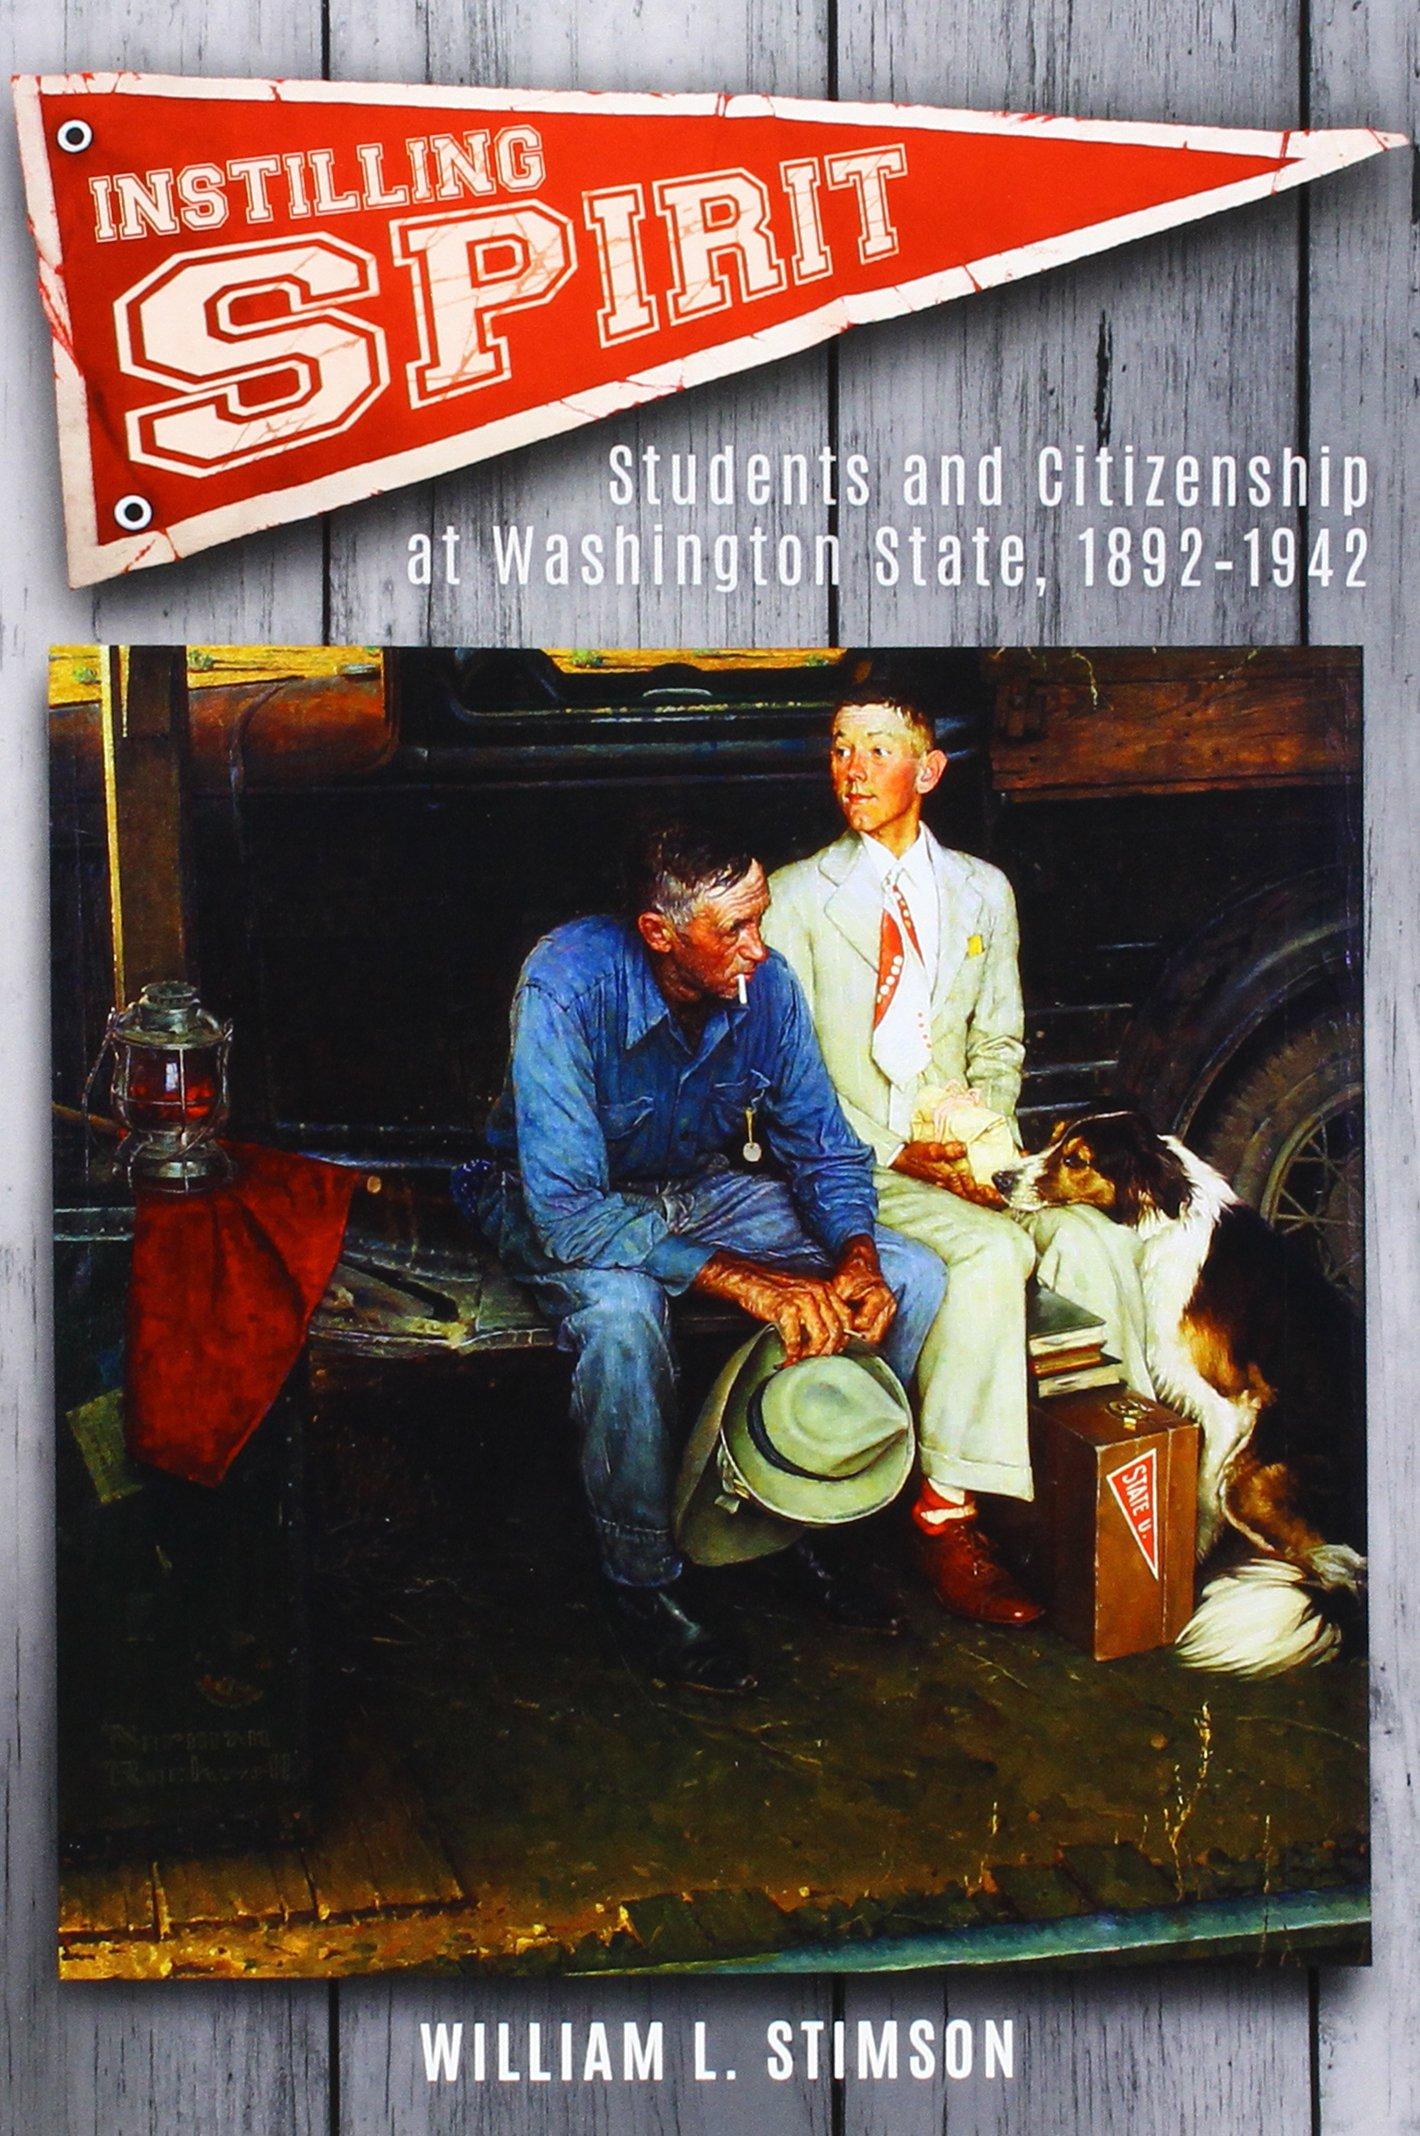 Download Instilling Spirit: Students and Citizenship at Washington State, 1892-1942 PDF